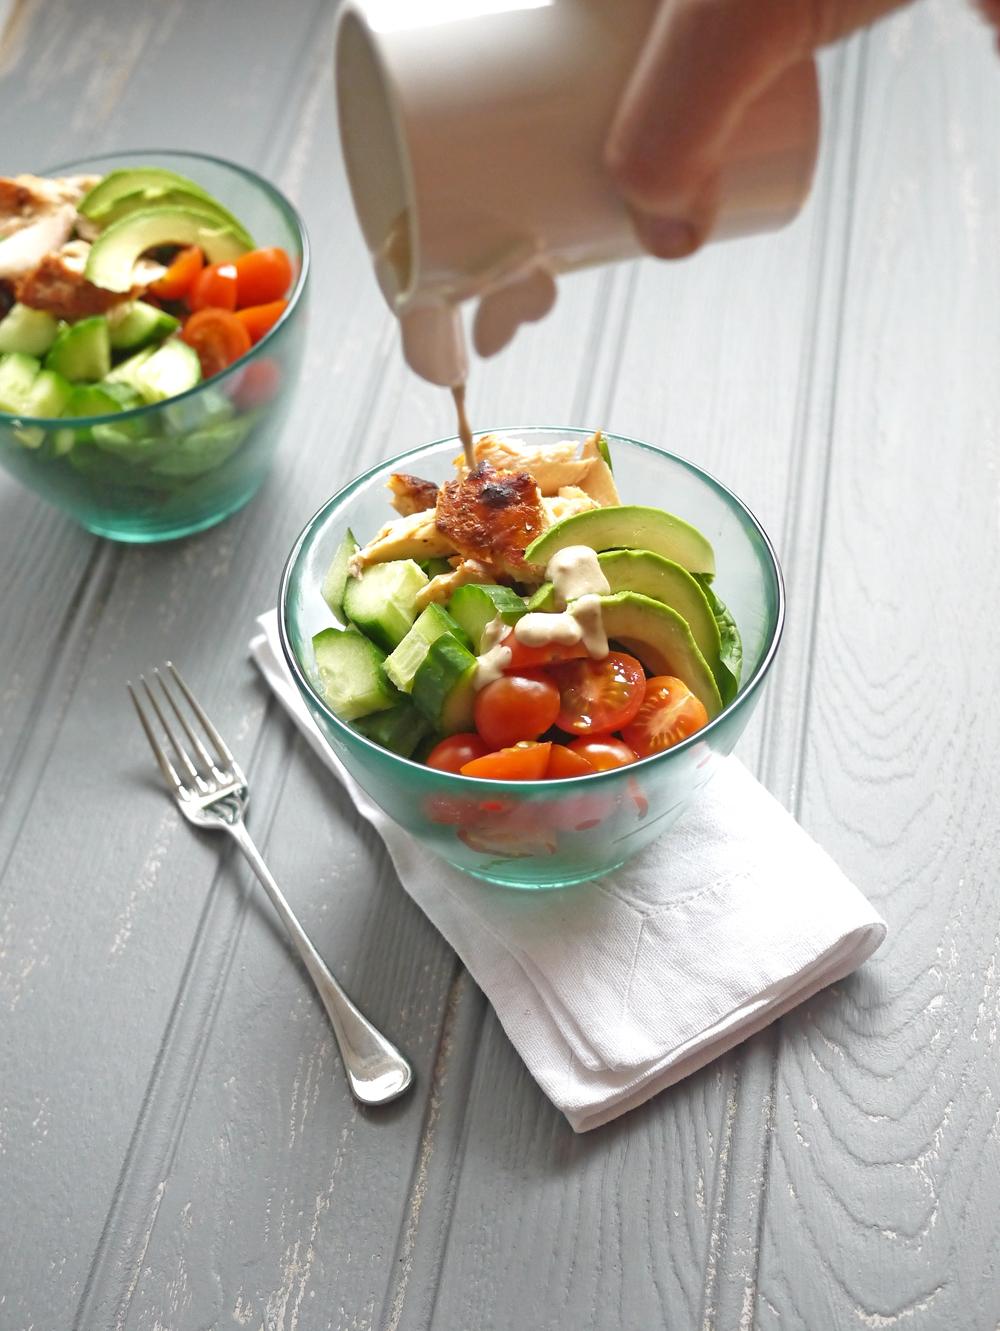 Salmon Salad with Lemon Tahini Dressing Pouring Dressing